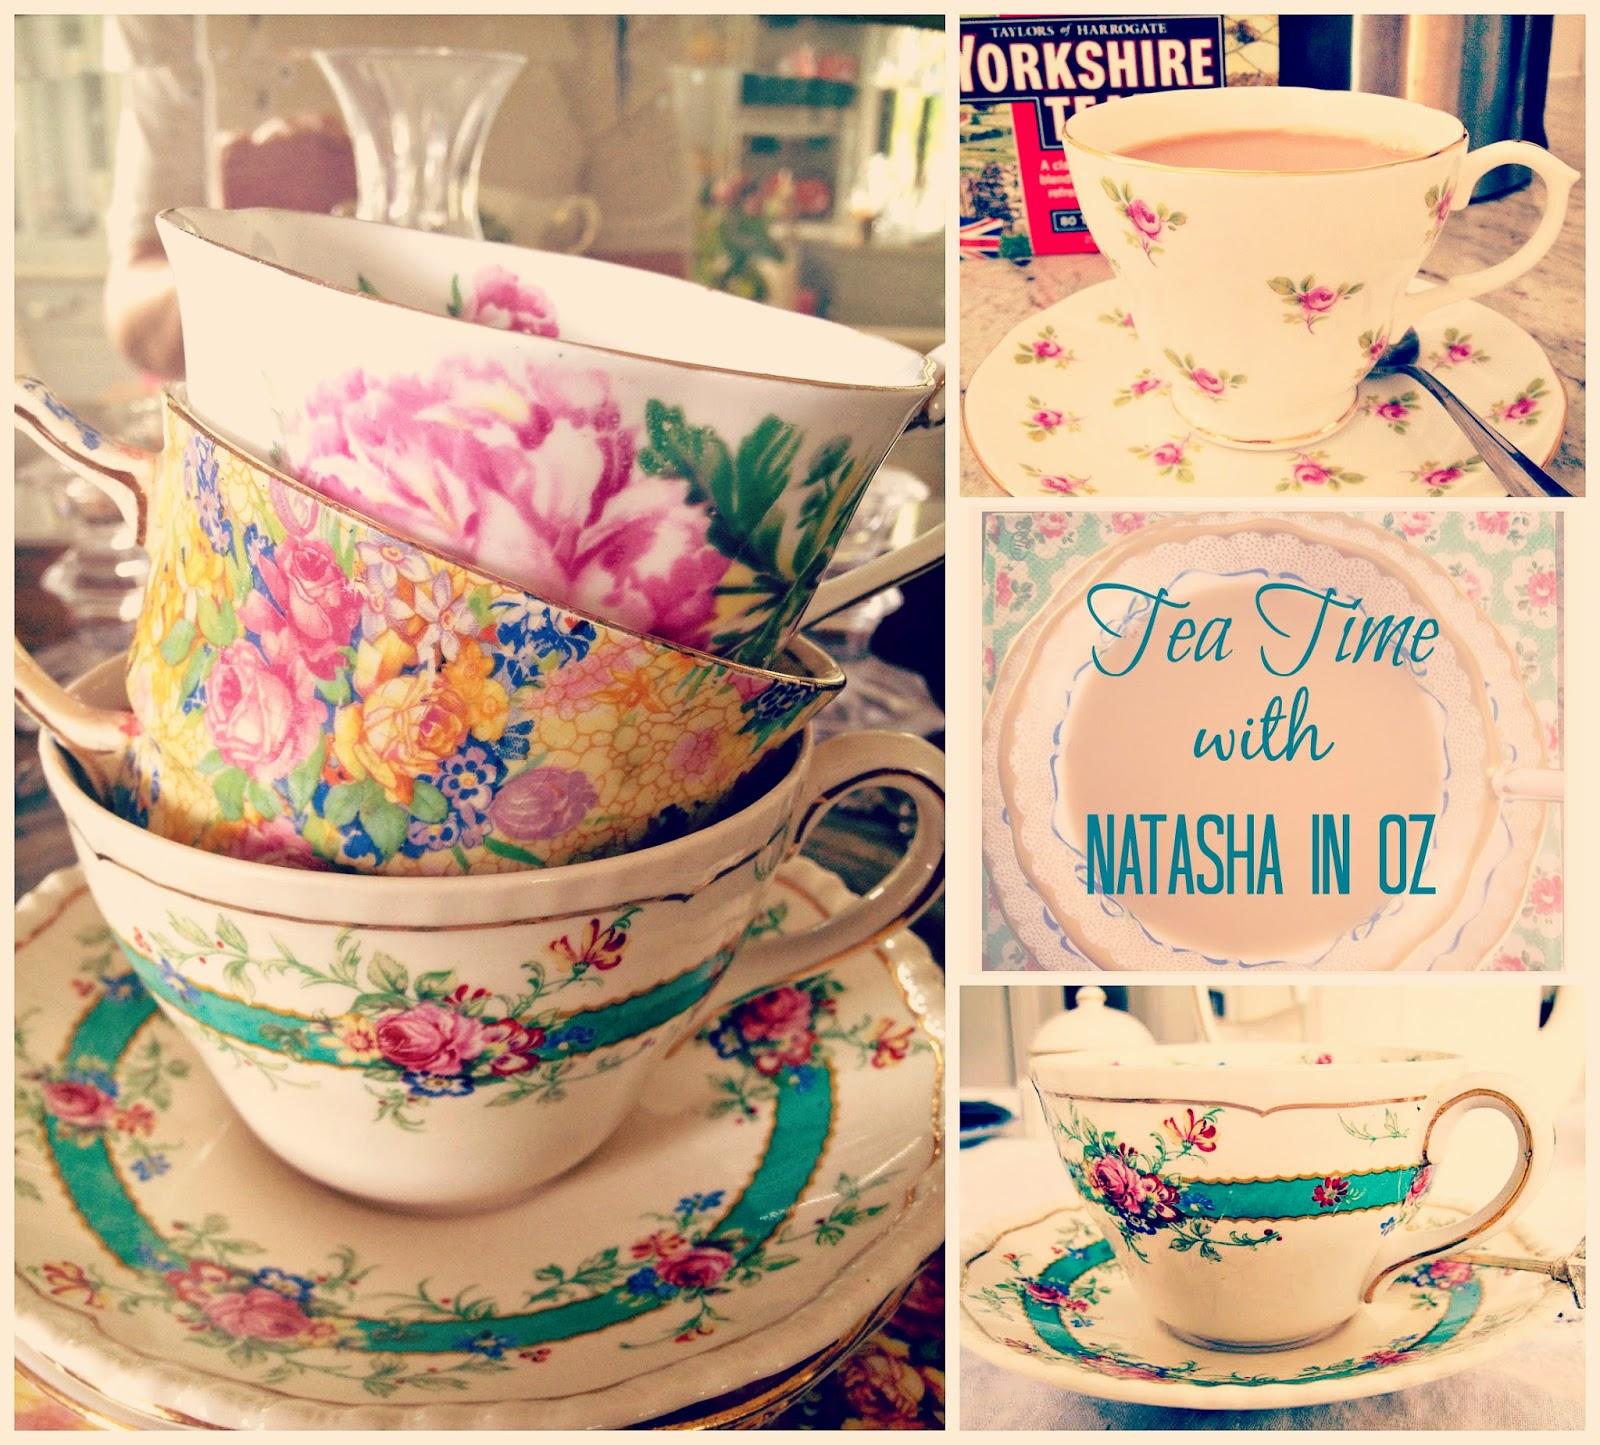 Tea, Tea cup candles, Tea Time Tuesday, Tea Time with Natasha in Oz, Vintage tea cups, Tea,